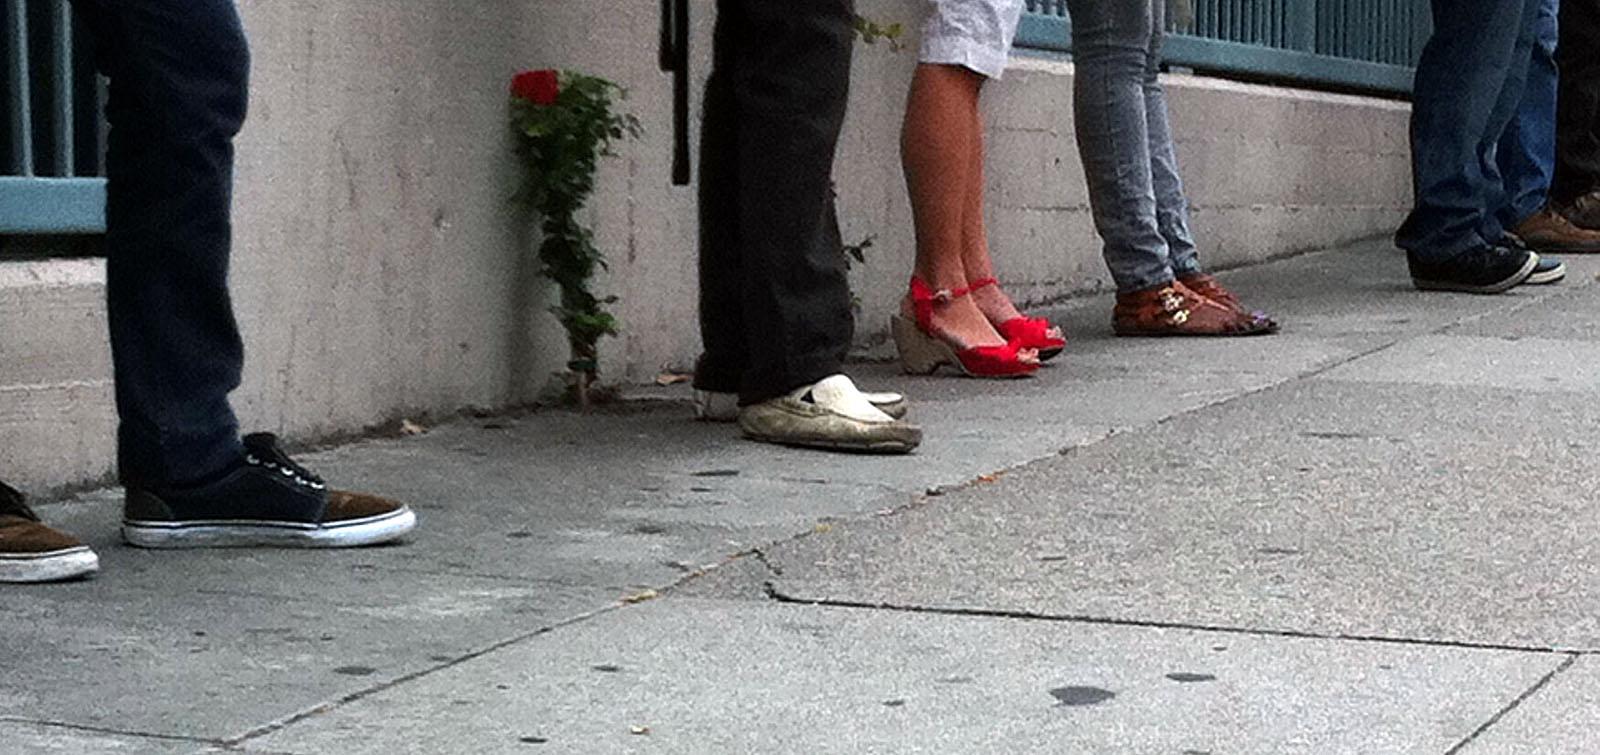 Thursday morning, Googlistas waiting for the bus.